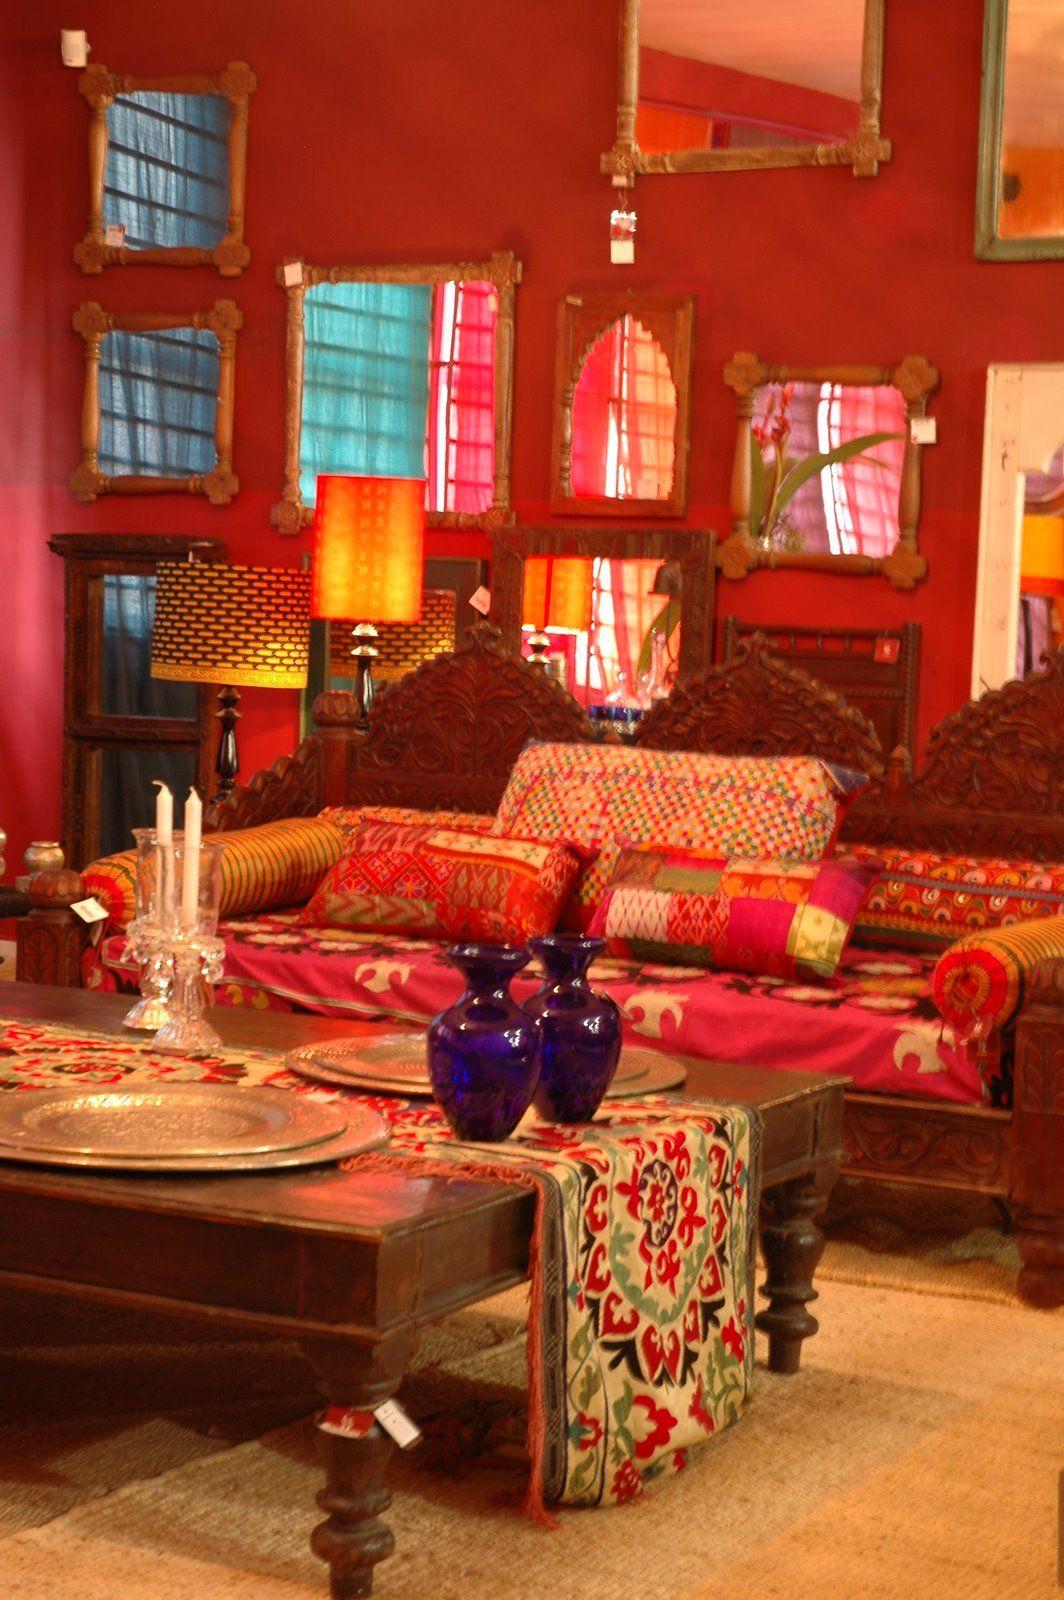 50 Indian Interior Design Ideas: Living Room Decor Apartment, Indian Decor, Moroccan Decor Living Room